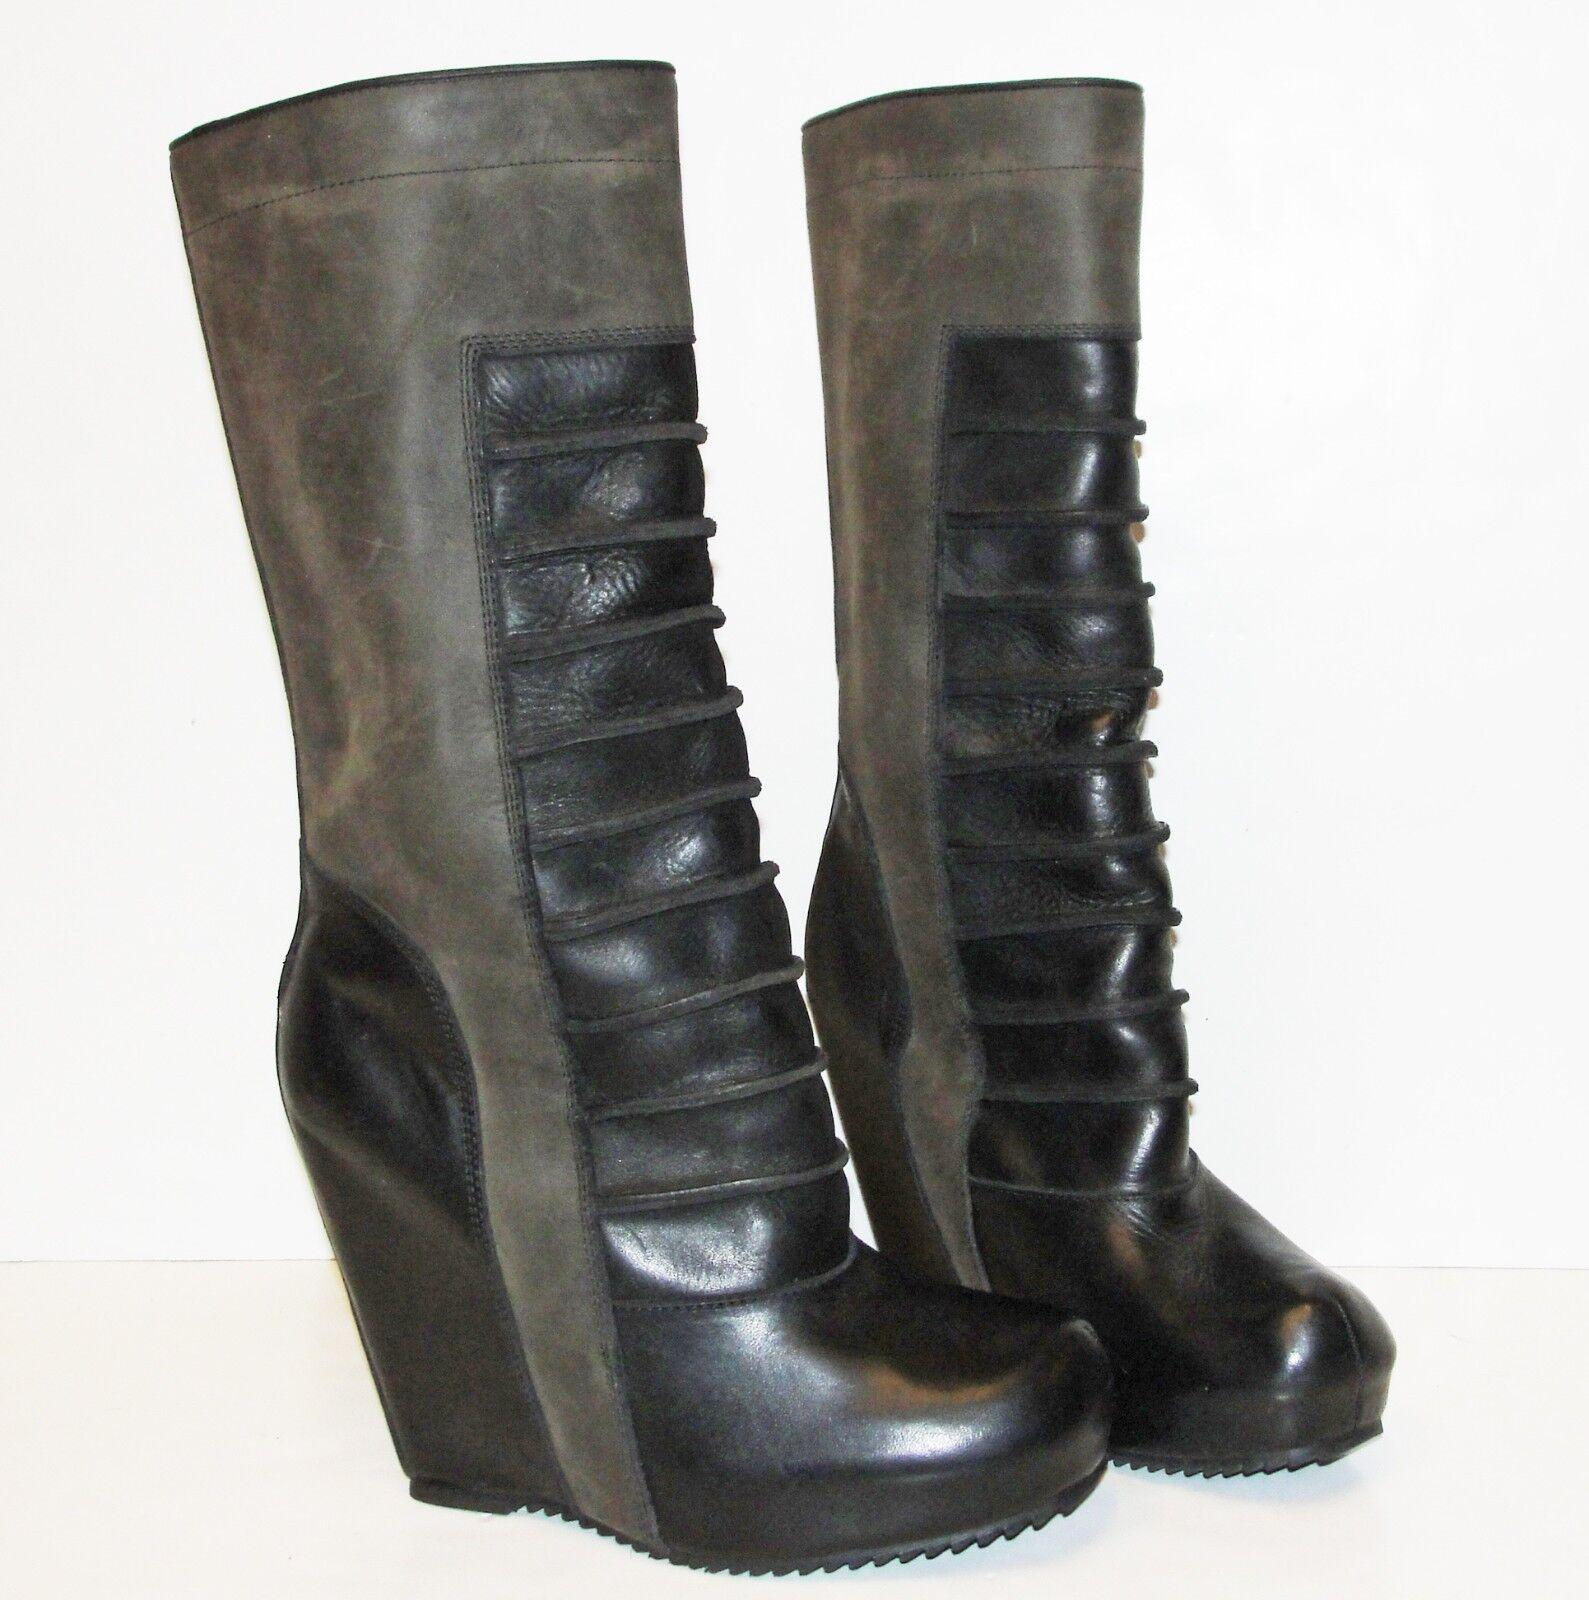 RICK OWENS Grün braun Ribbed Calf Leather Ruhlmann Wedge Mid Calf Ribbed Stiefel 38.5 NEW b8ff4c